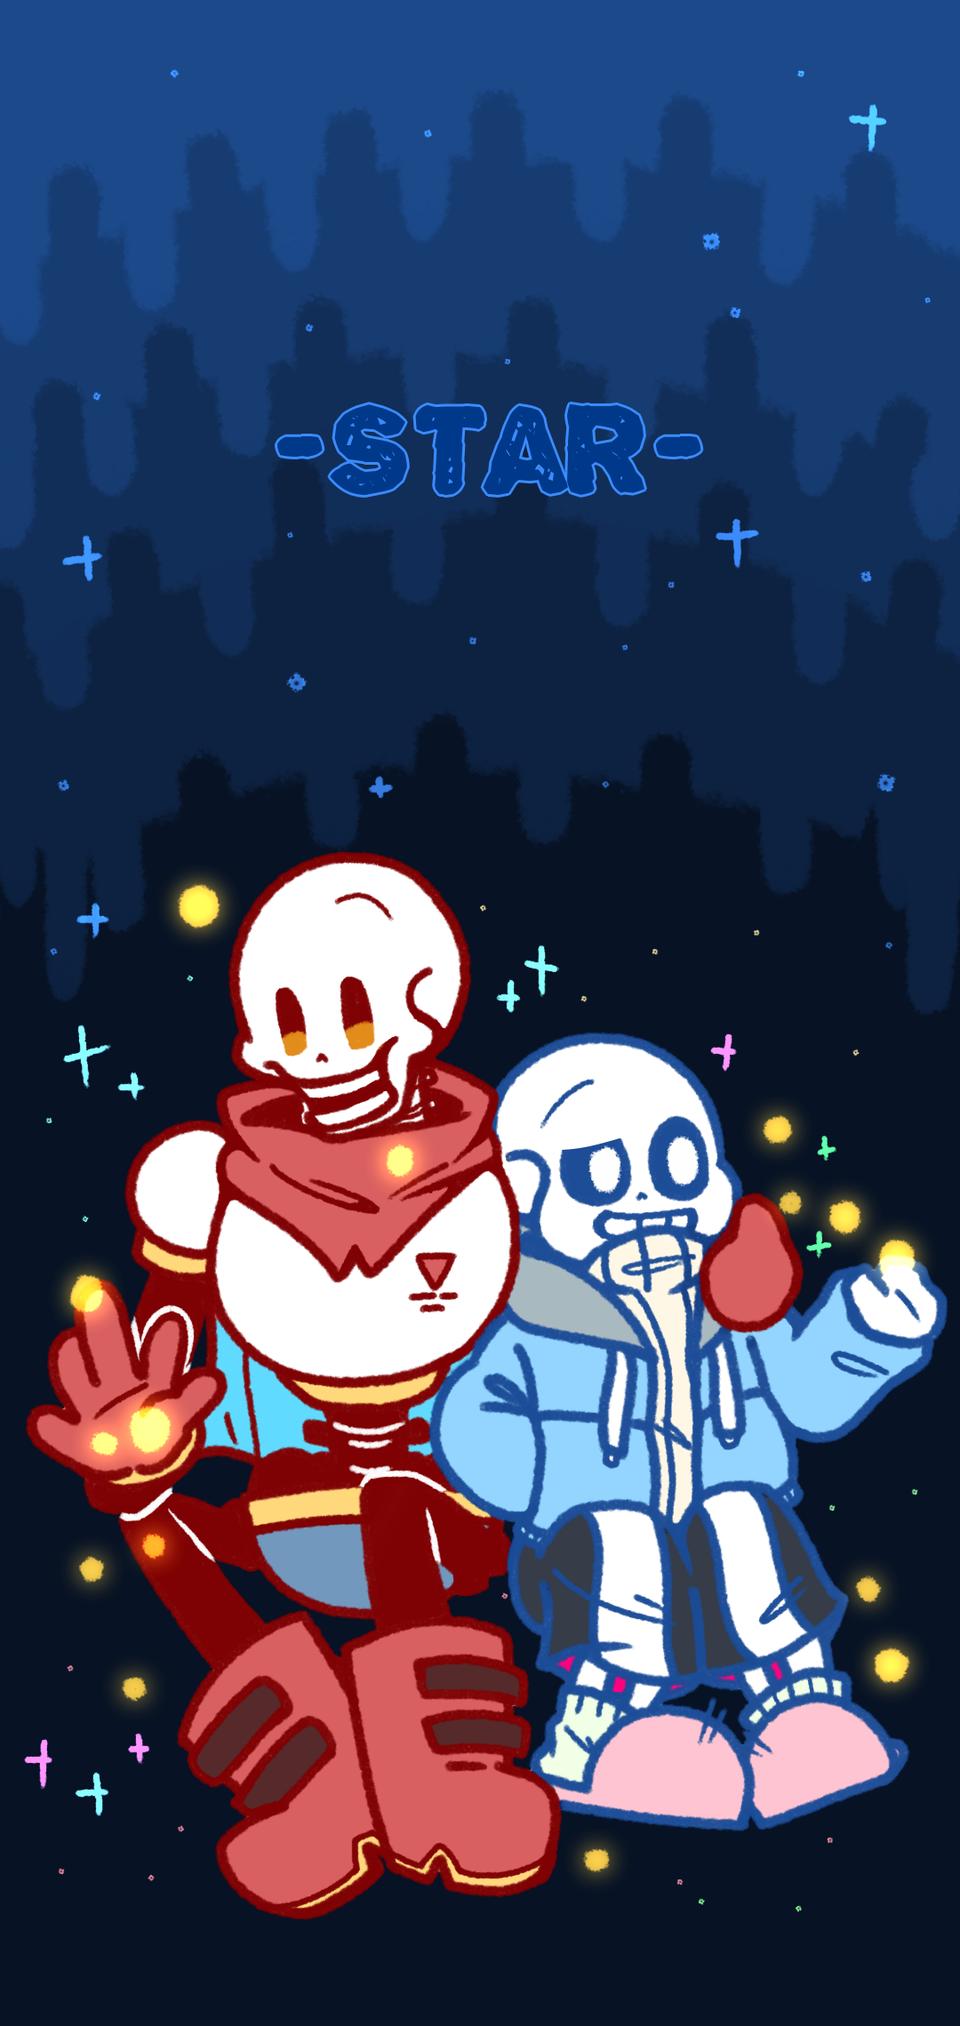 -STAR-